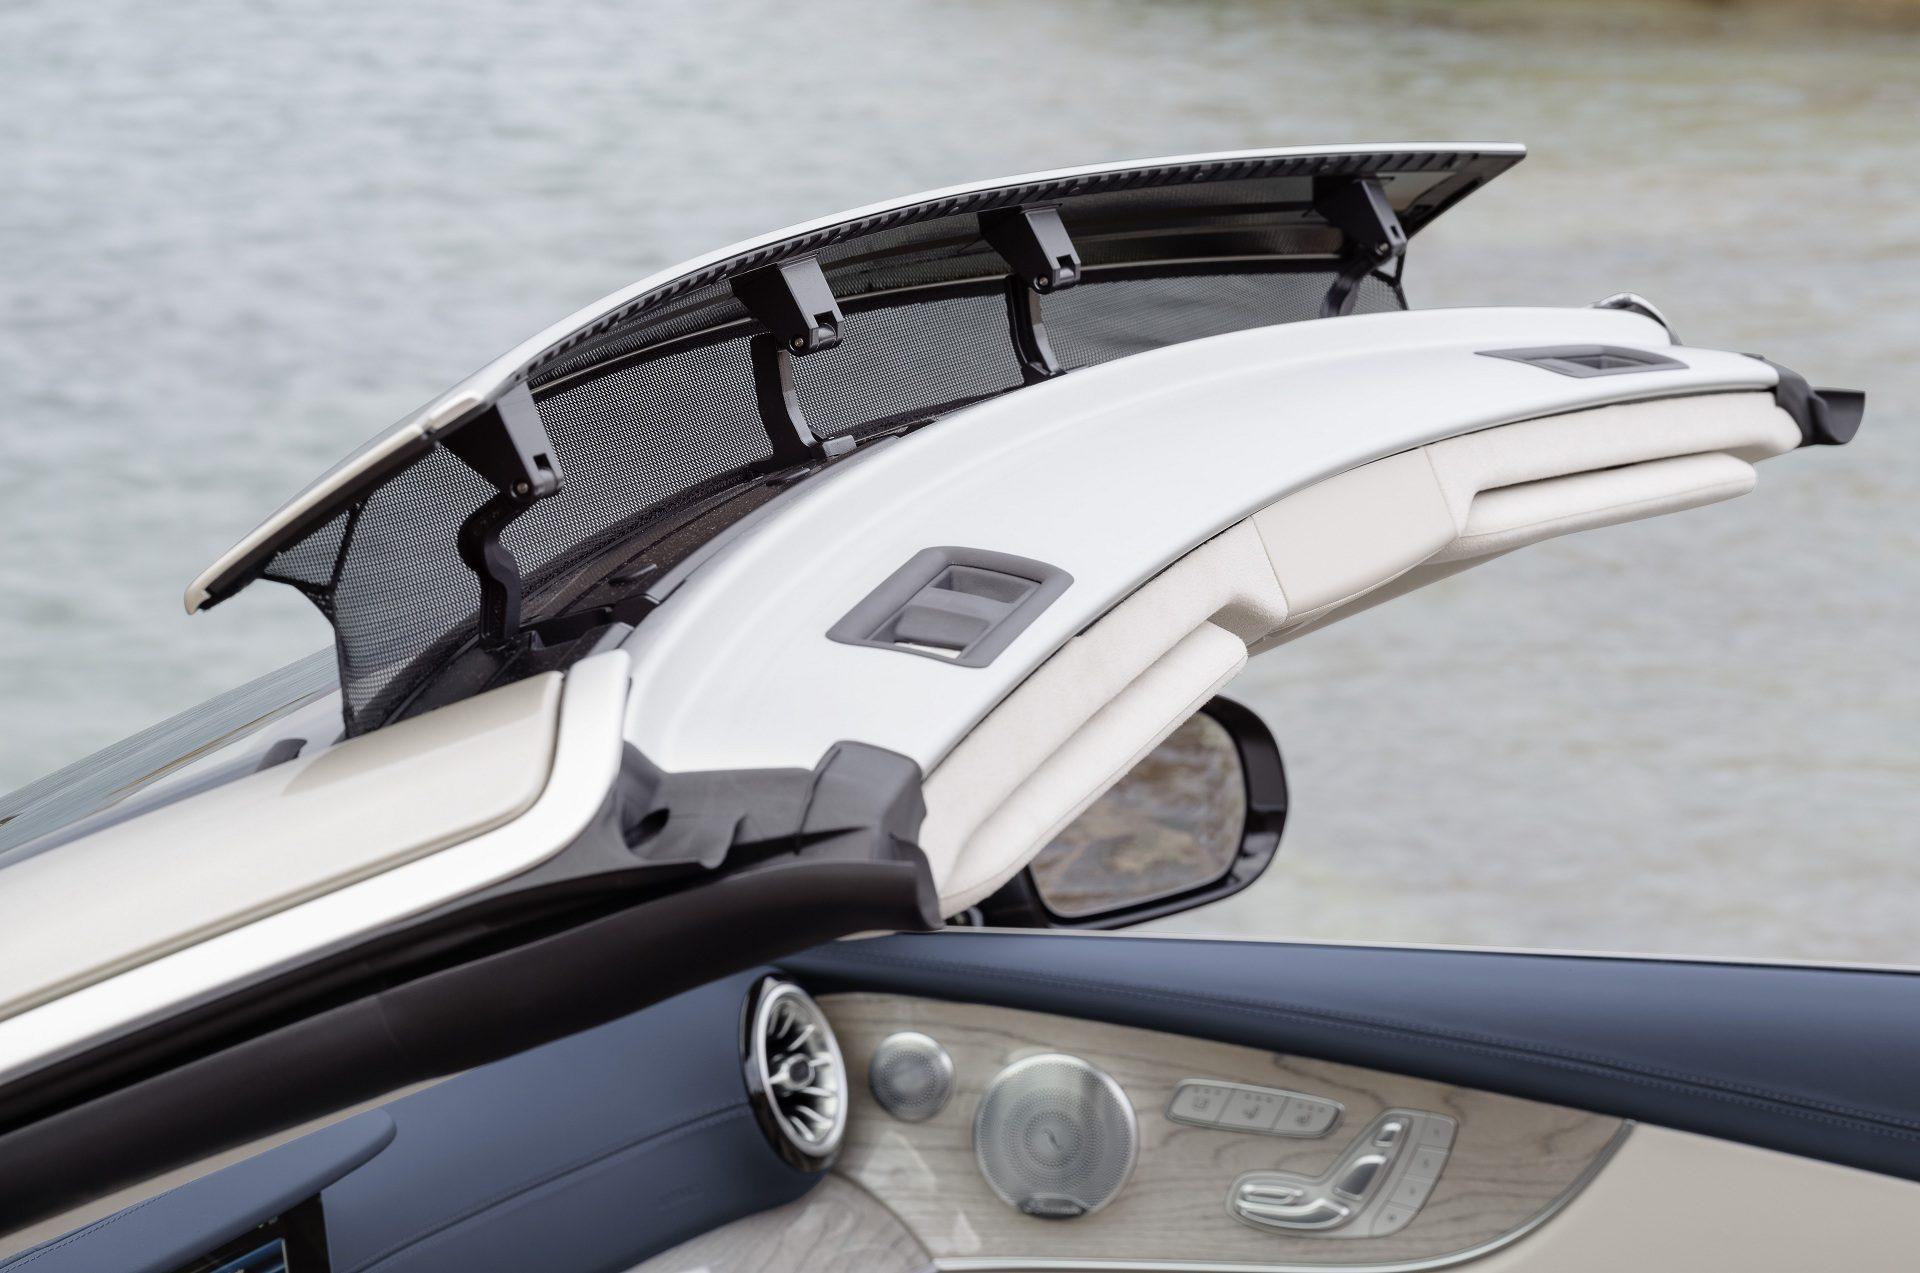 Mercedes-Benz E-Klasse Cabriolet; 2017; Exterieur: aragonitsilber metallic, AMG Line; Interieur: yachtblau / macchiatobeige; Zierteile: Holz sen hellbraun glänzend // Mercedes-Benz E-Class Cabriolet; 2017; exterior: aragonite silver metallic, AMG line; interior: yacht blue / macchiato beige, trim parts: high-gloss light brown sen wood